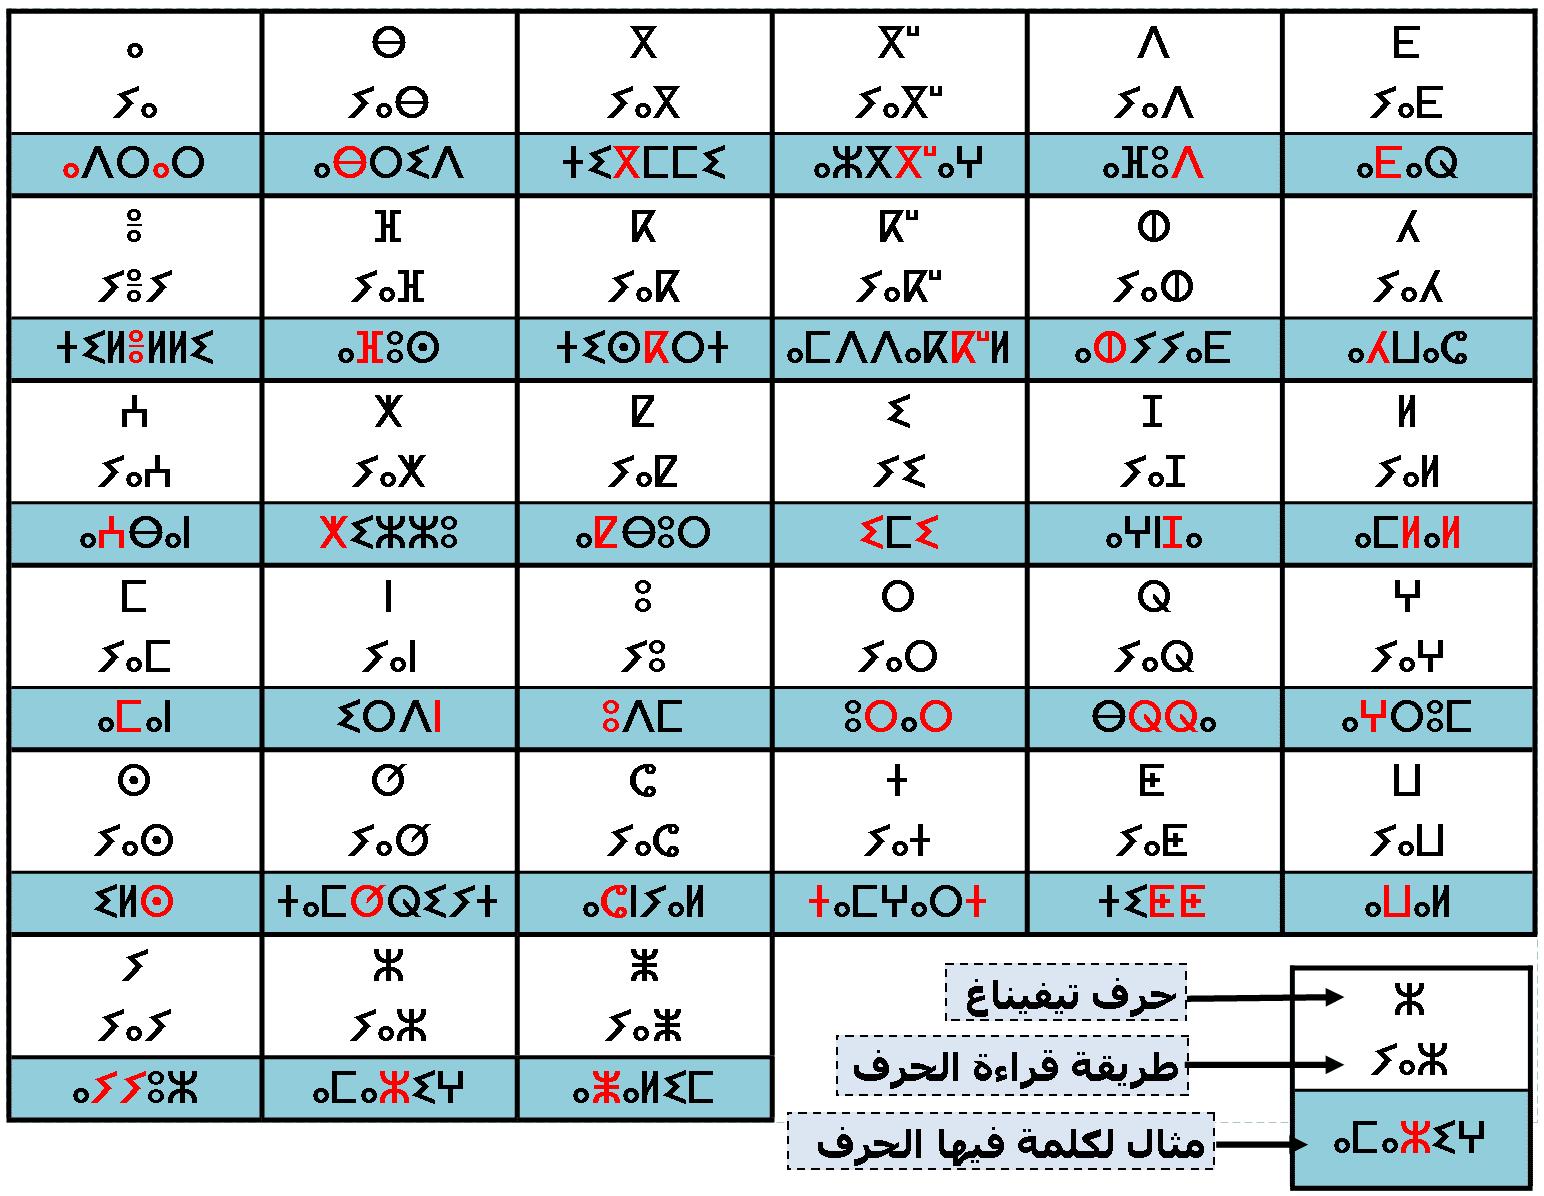 alphabet tifinagh ⵜⵉⴼⵉⵏⴰⵖ